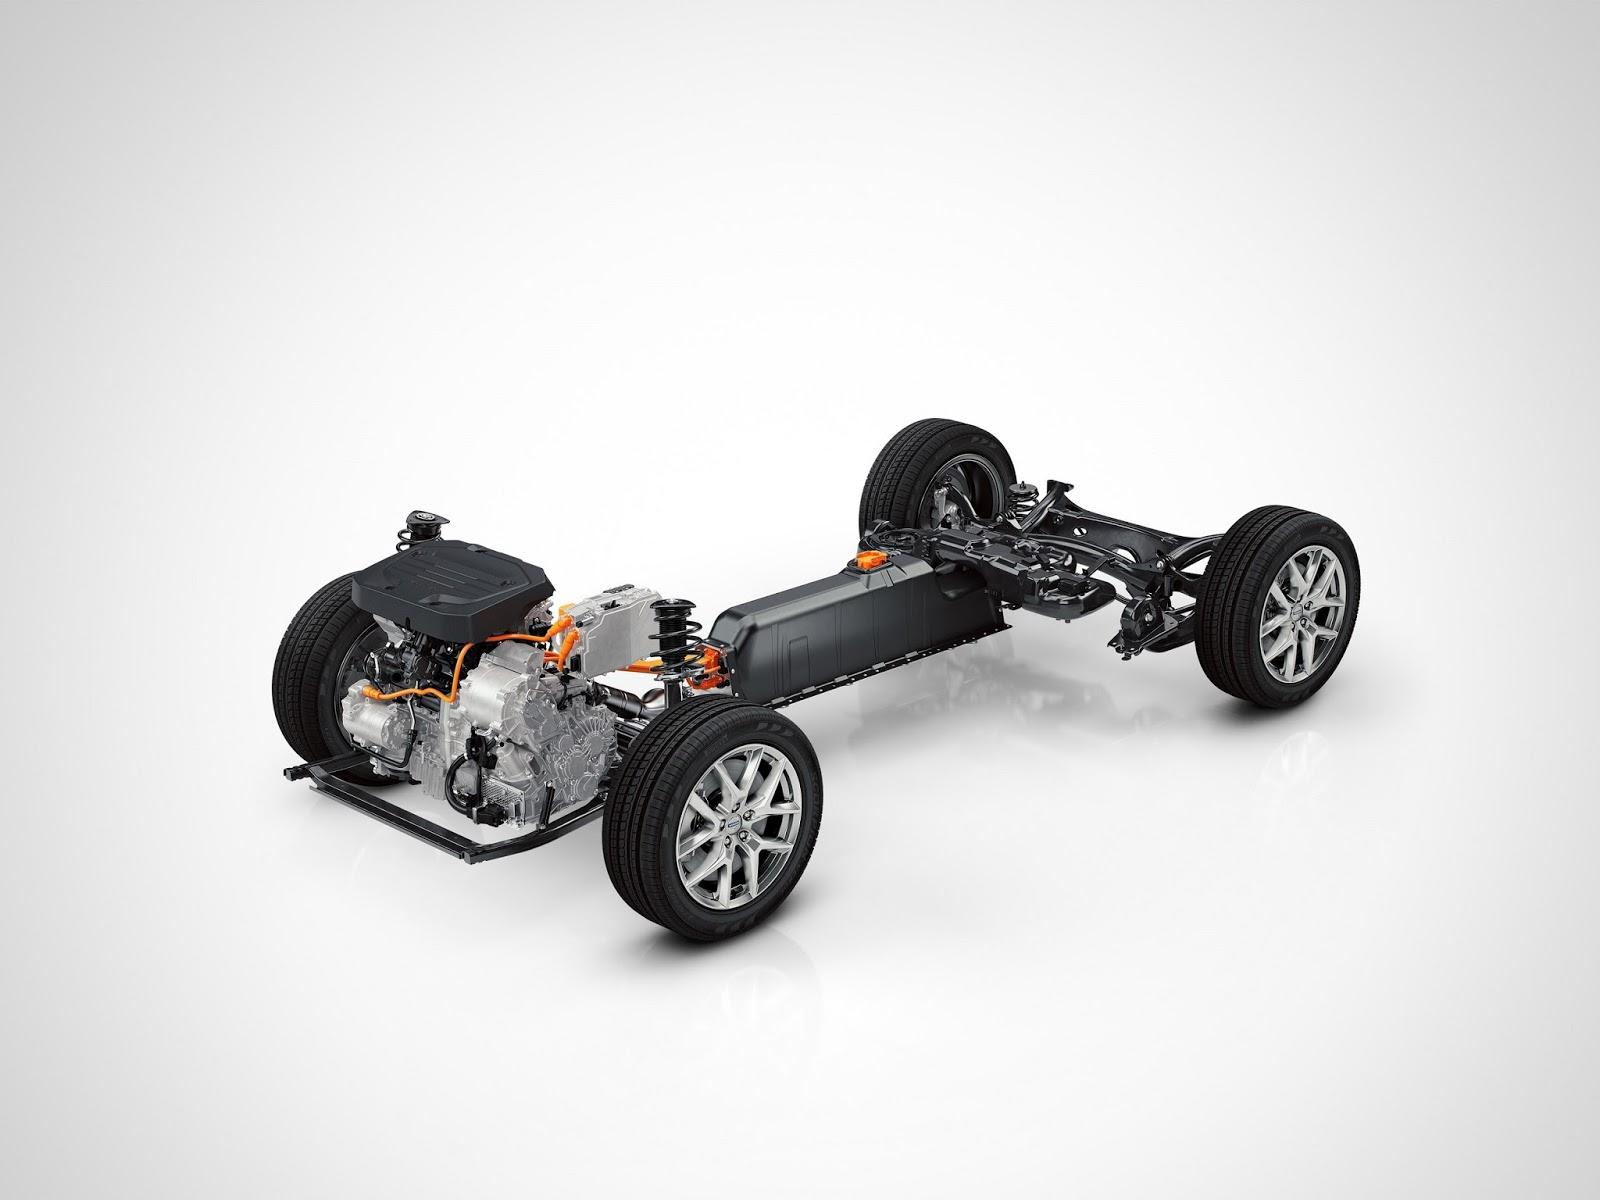 VOLVO COMPACT%2BMODULAR%2BARCHITECTURE 1 Η Volvo το 2017 θα λανσάρει μικρό υβριδικό αυτοκίνητο Hybrid, Volvo